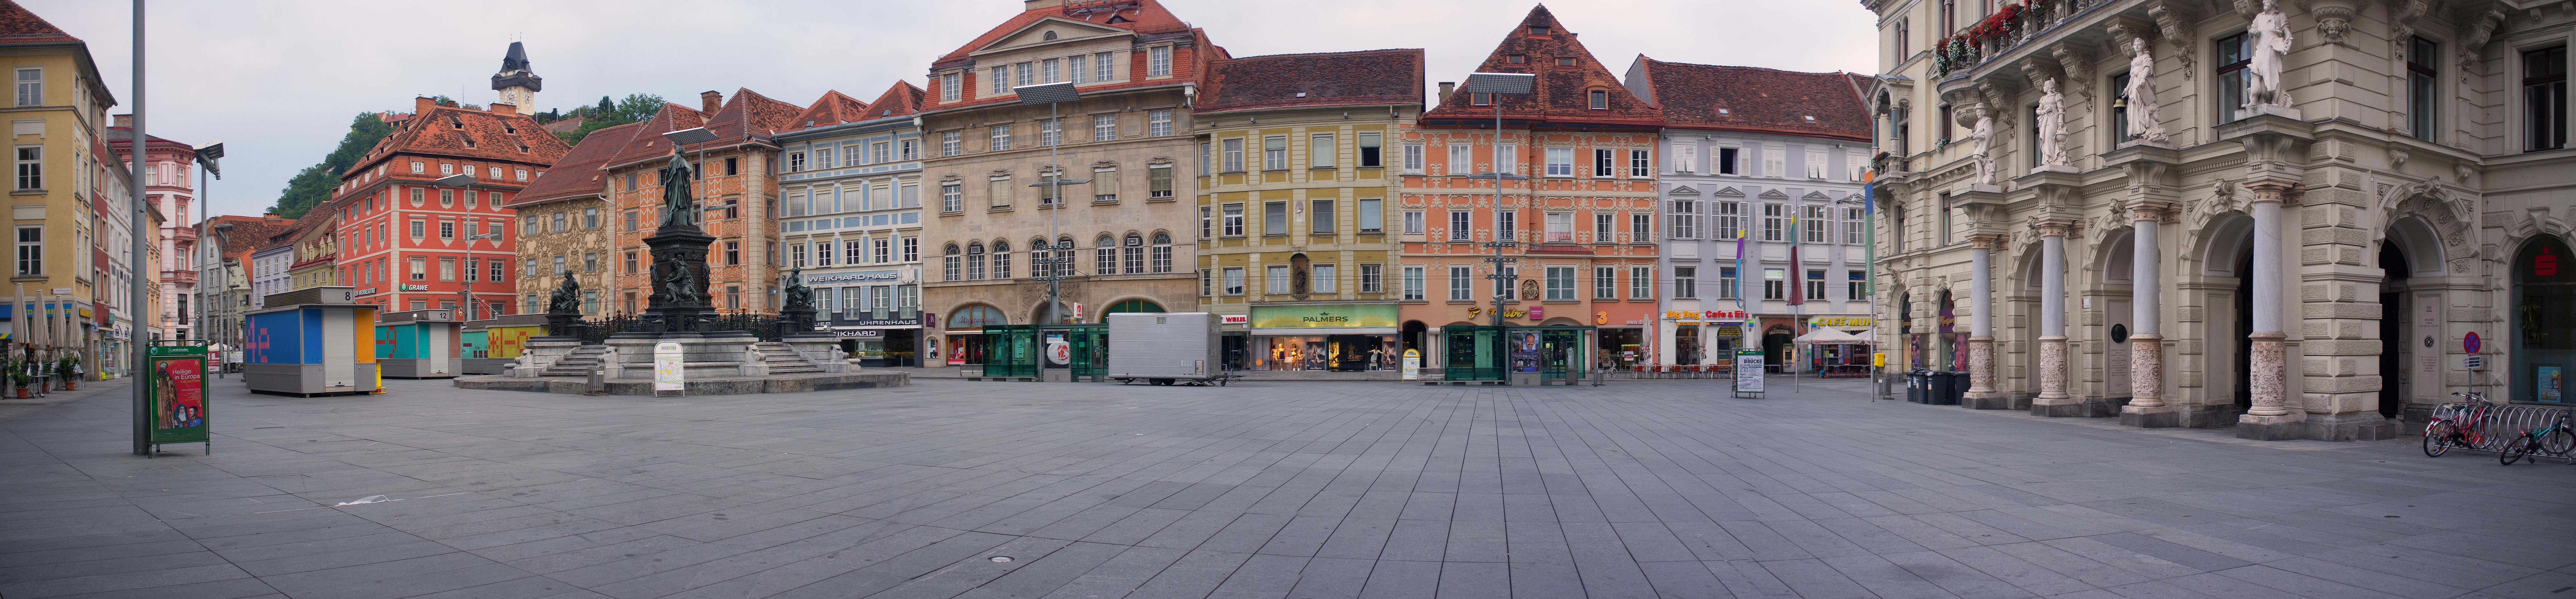 Panorama vom Grazer Hauptplatz